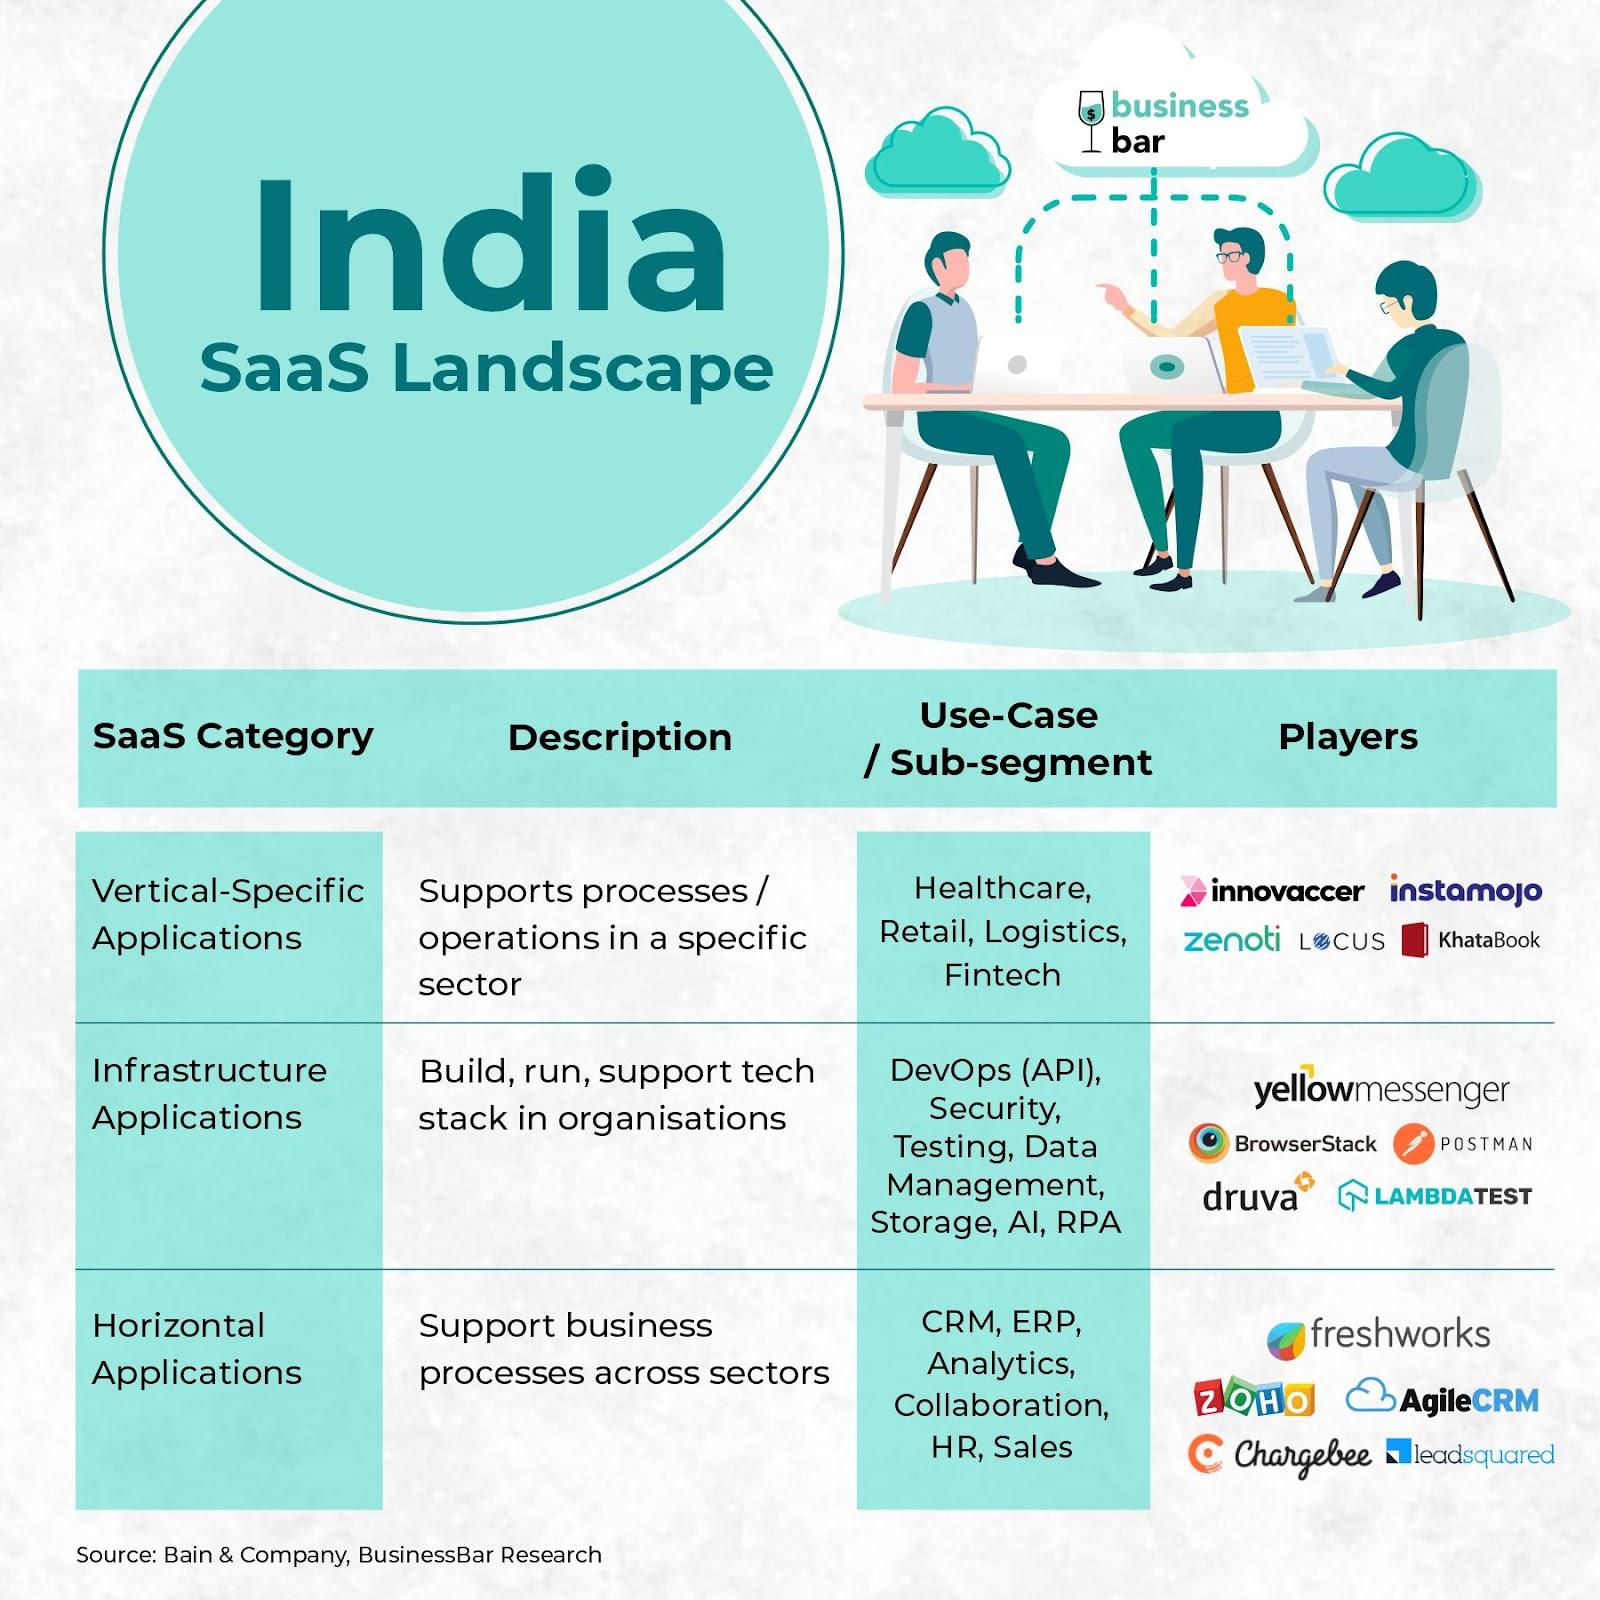 India SaaS Landscape Categorisation